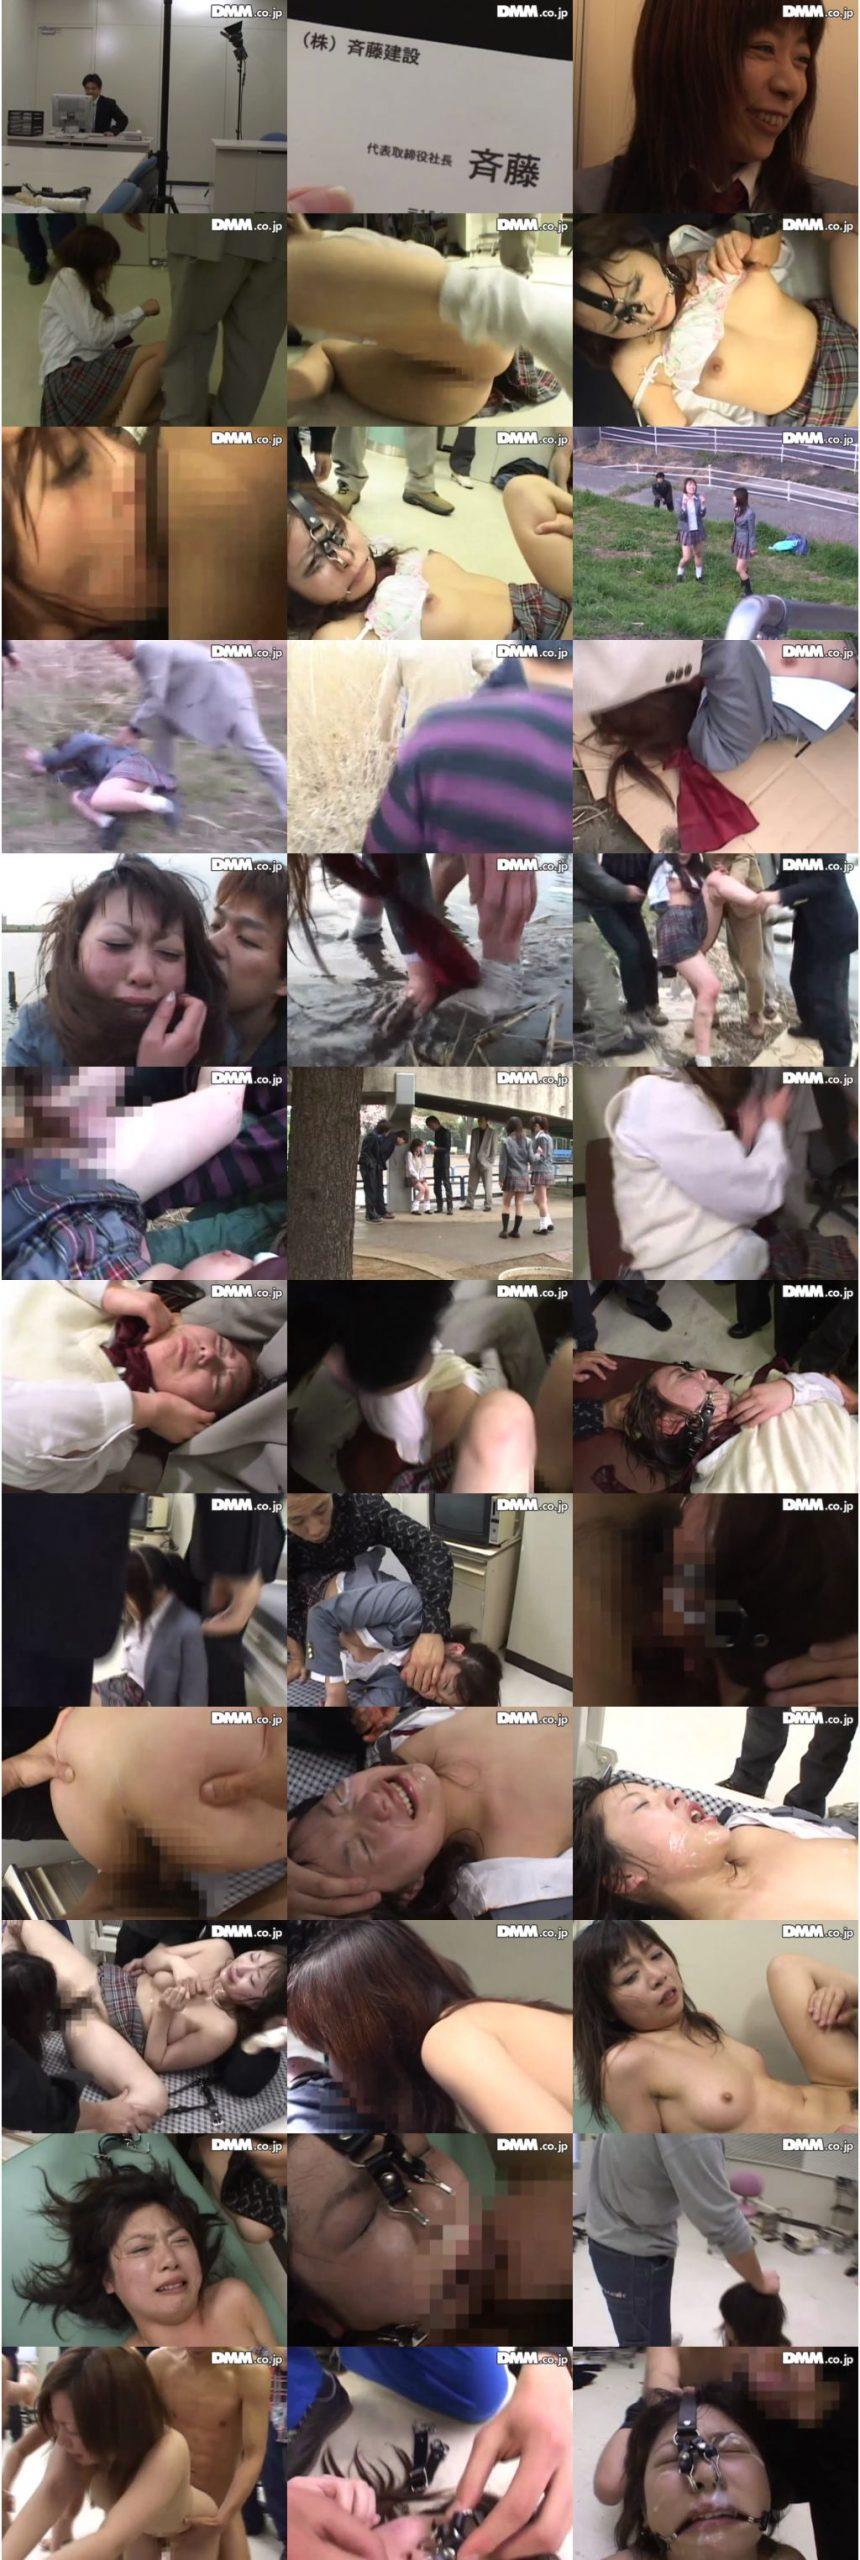 [ATID-001] 古物取引 No.11●11 メロン堂オリジナル 裏… School Girls アタッカーズ Other Aizawa Yume Harada Haruna